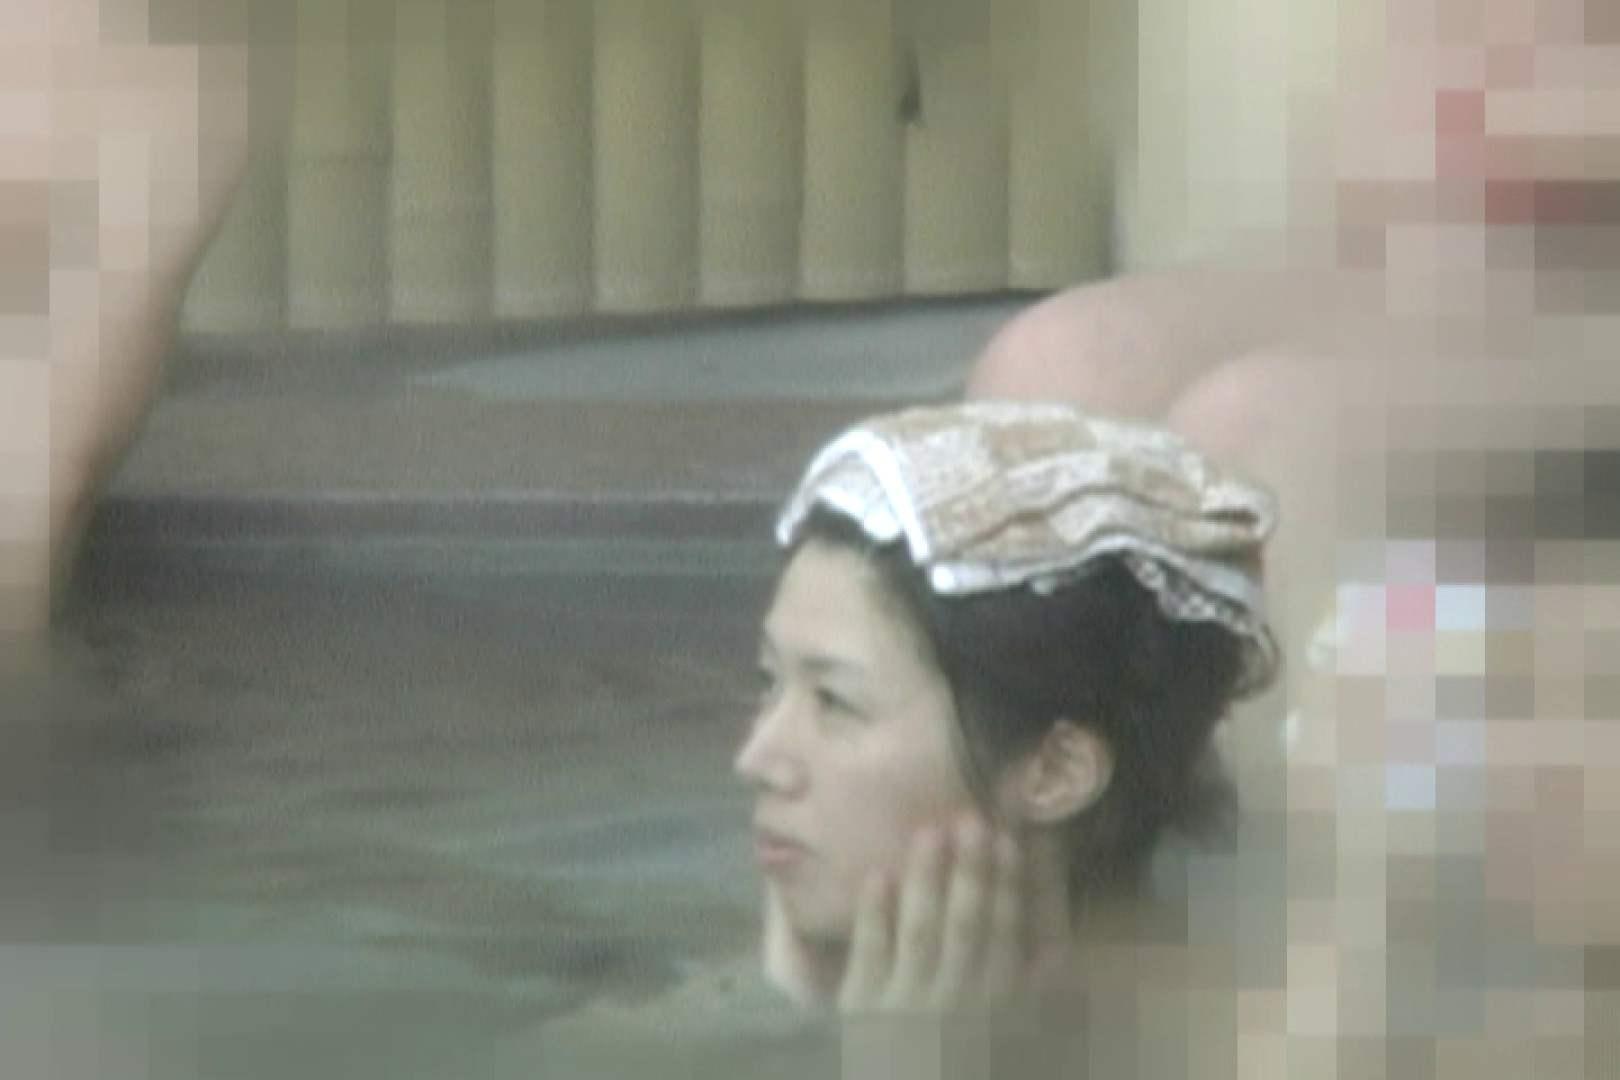 Aquaな露天風呂Vol.856 0  41連発 15